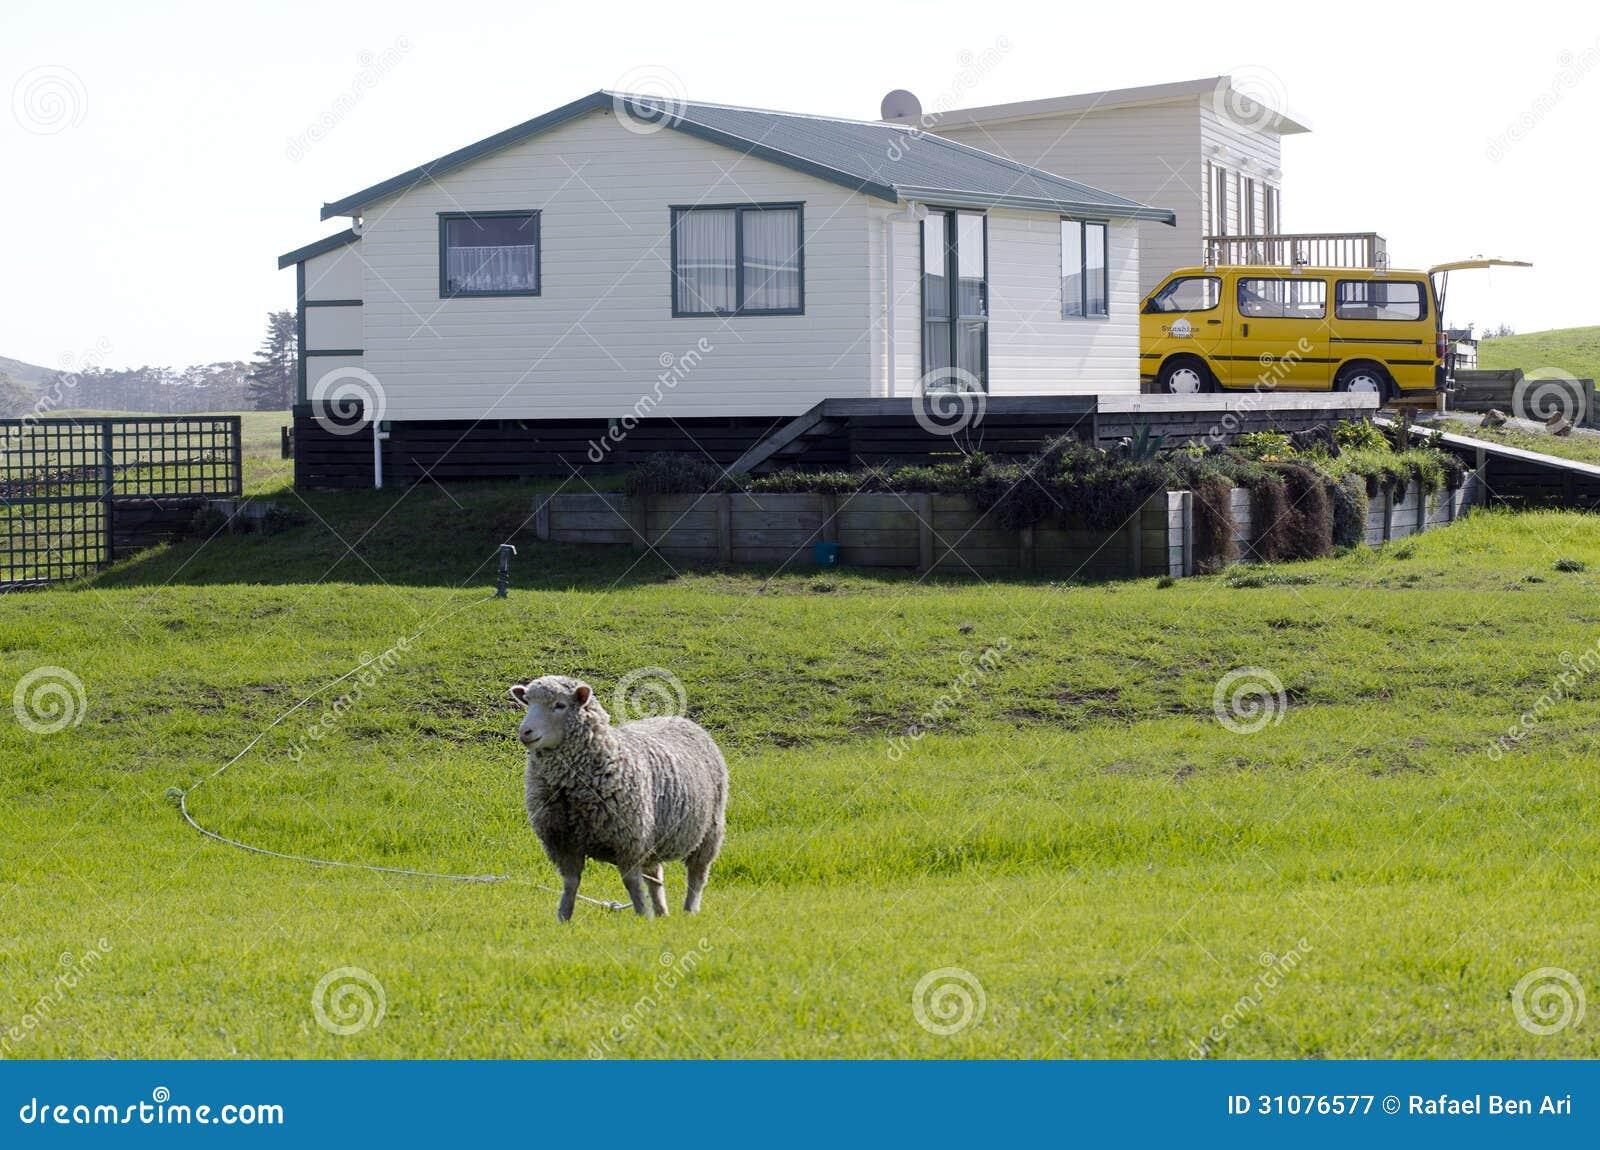 Sheep Grazing In A Backyard Editorial Photography